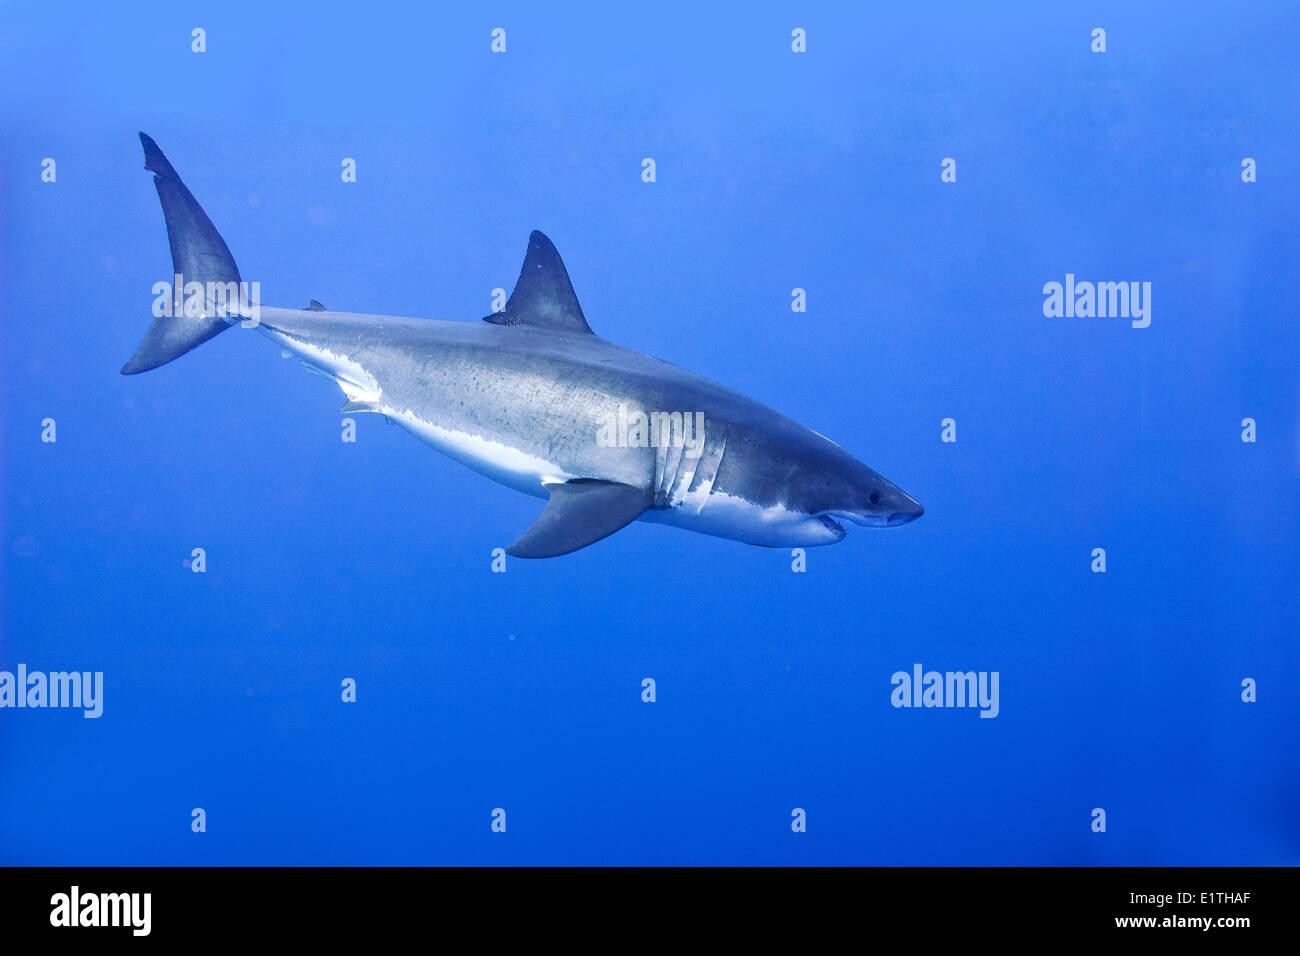 Great white shark (Carcharodon carcharias), Isla Guadalupe, Baja, Mexico Stock Photo